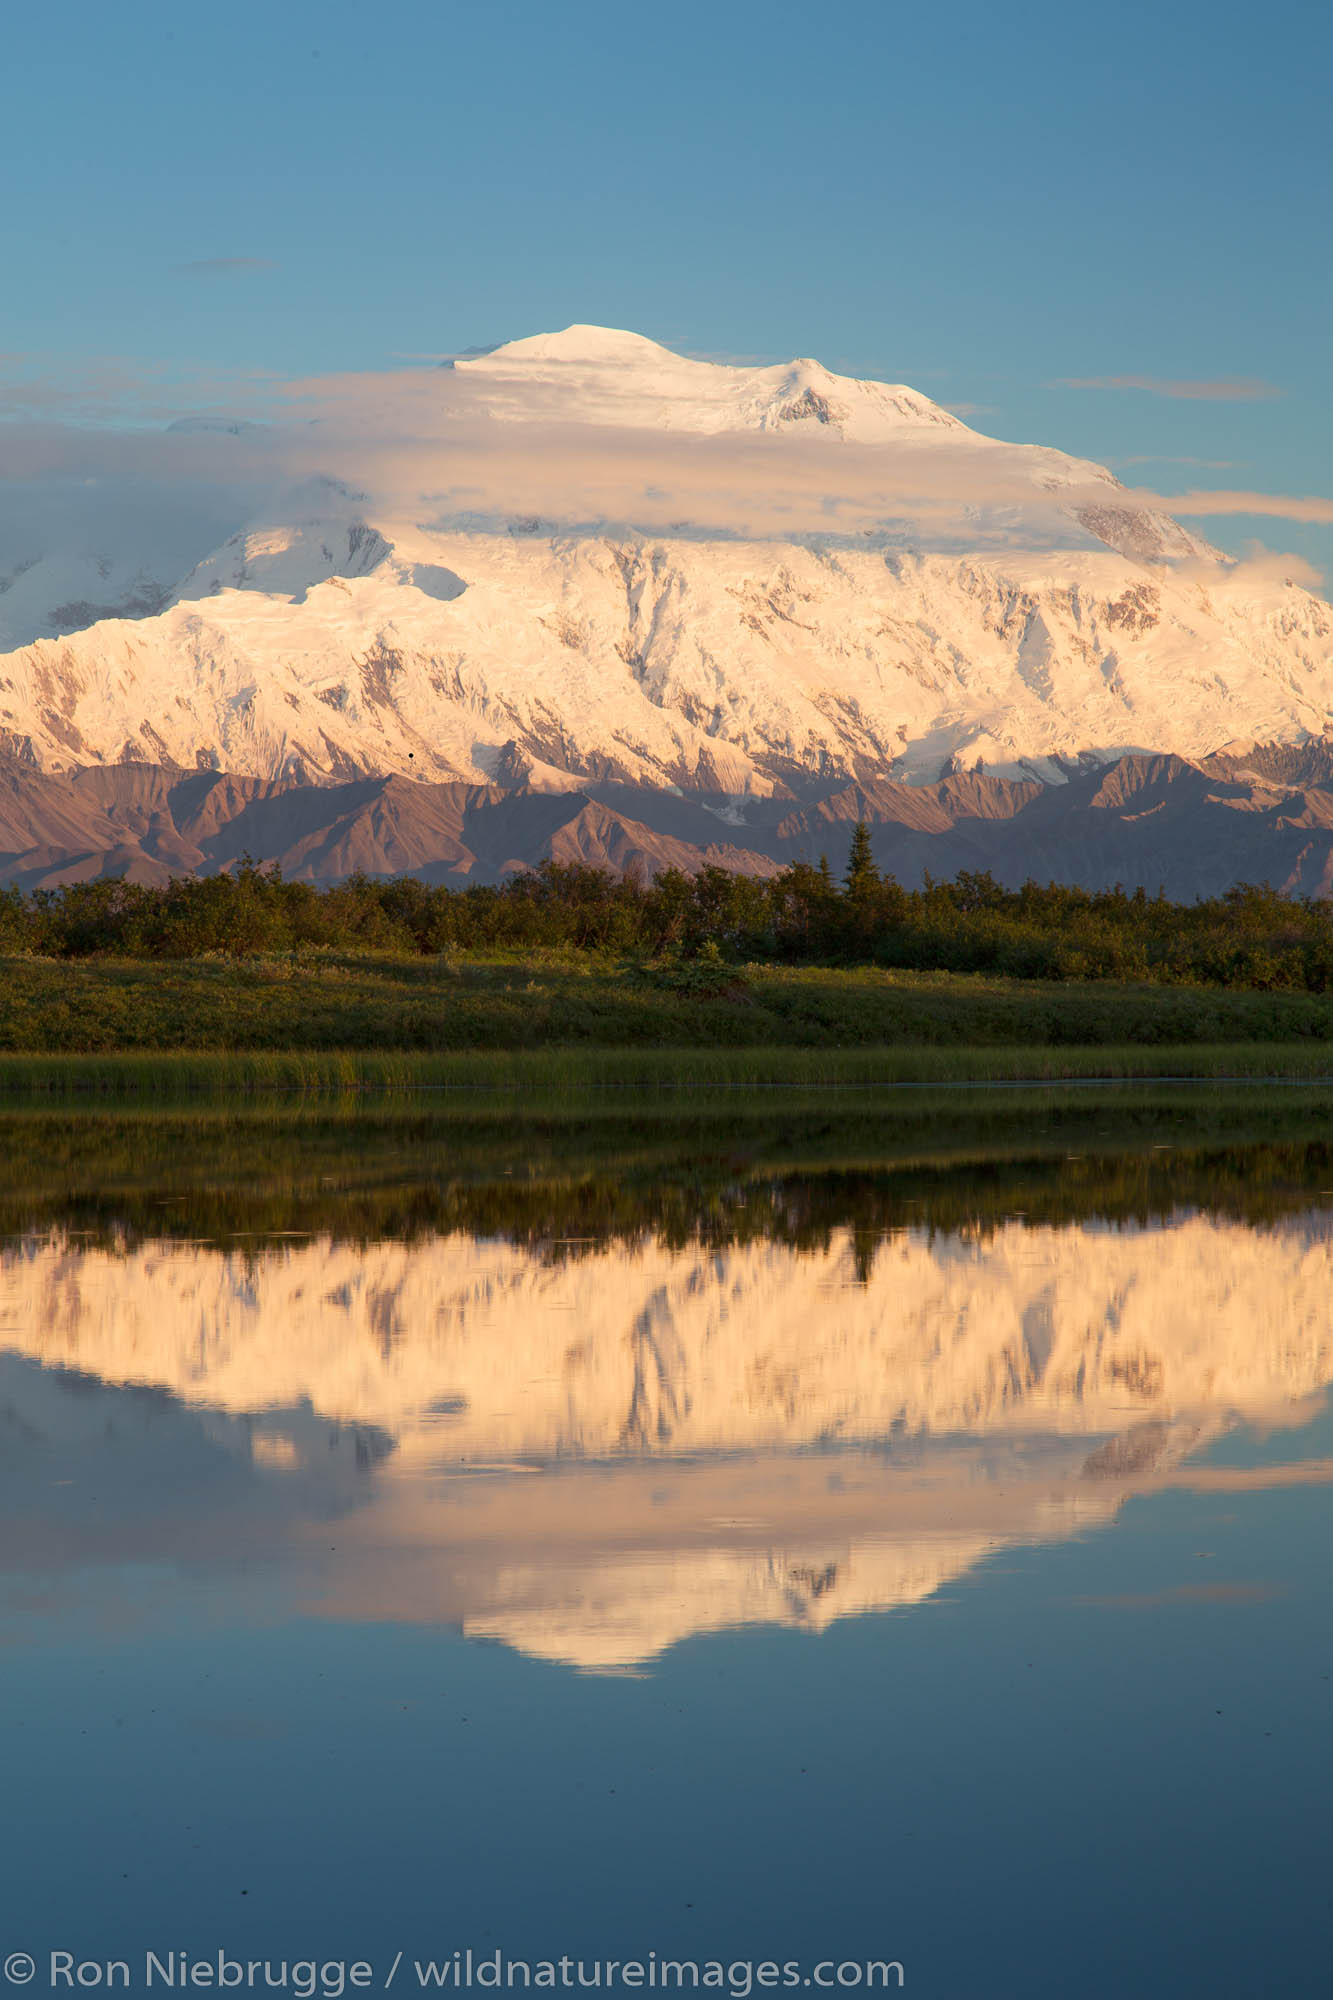 Mt. McKinley, locally known as Denali, at Reflection Pond, Denali National Park, Alaska.